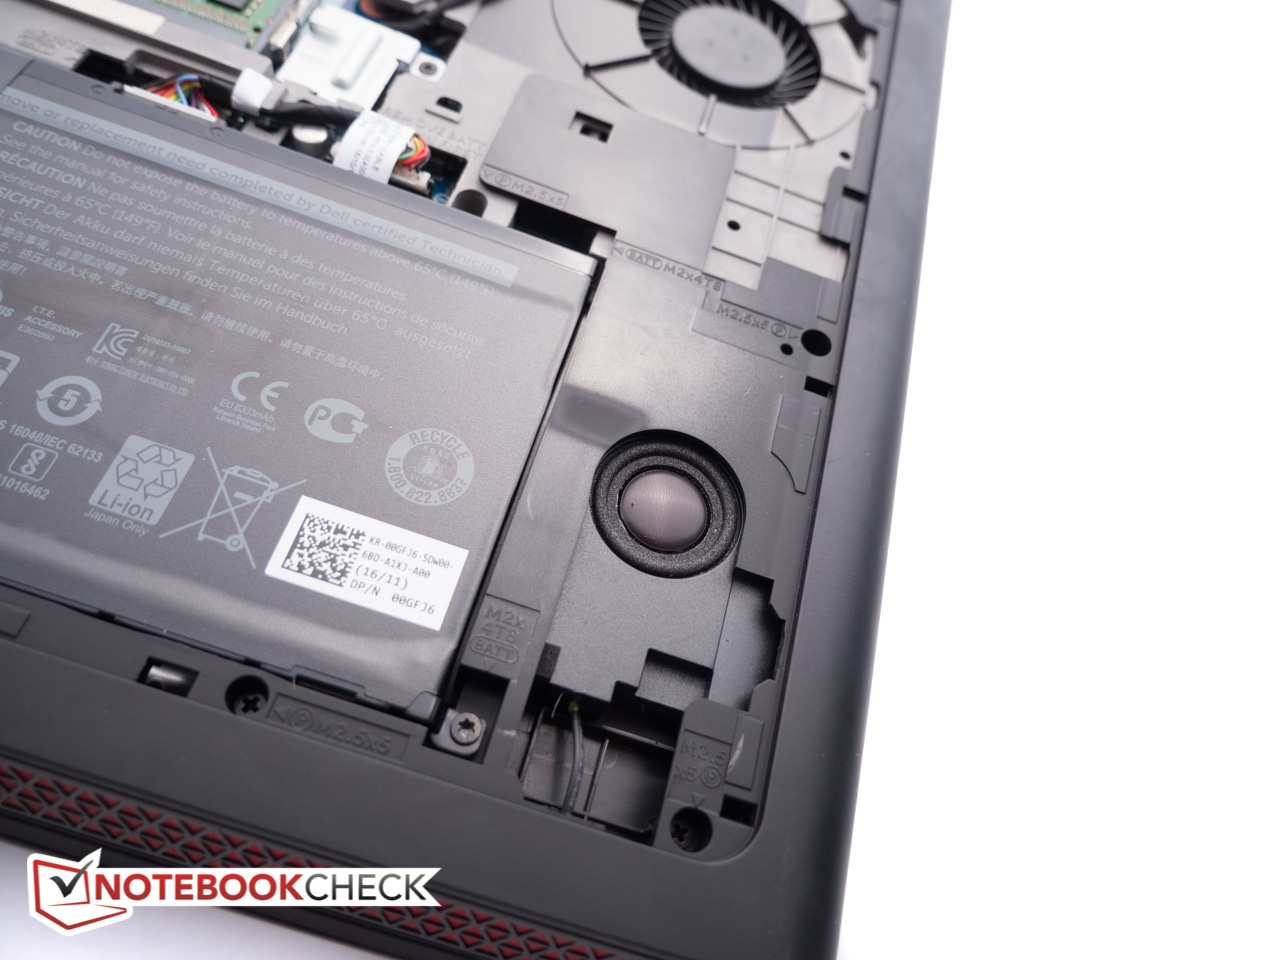 Dell Inspiron 15 7000 7567 Gaming (i5-7300HQ, GTX 1050) Laptop